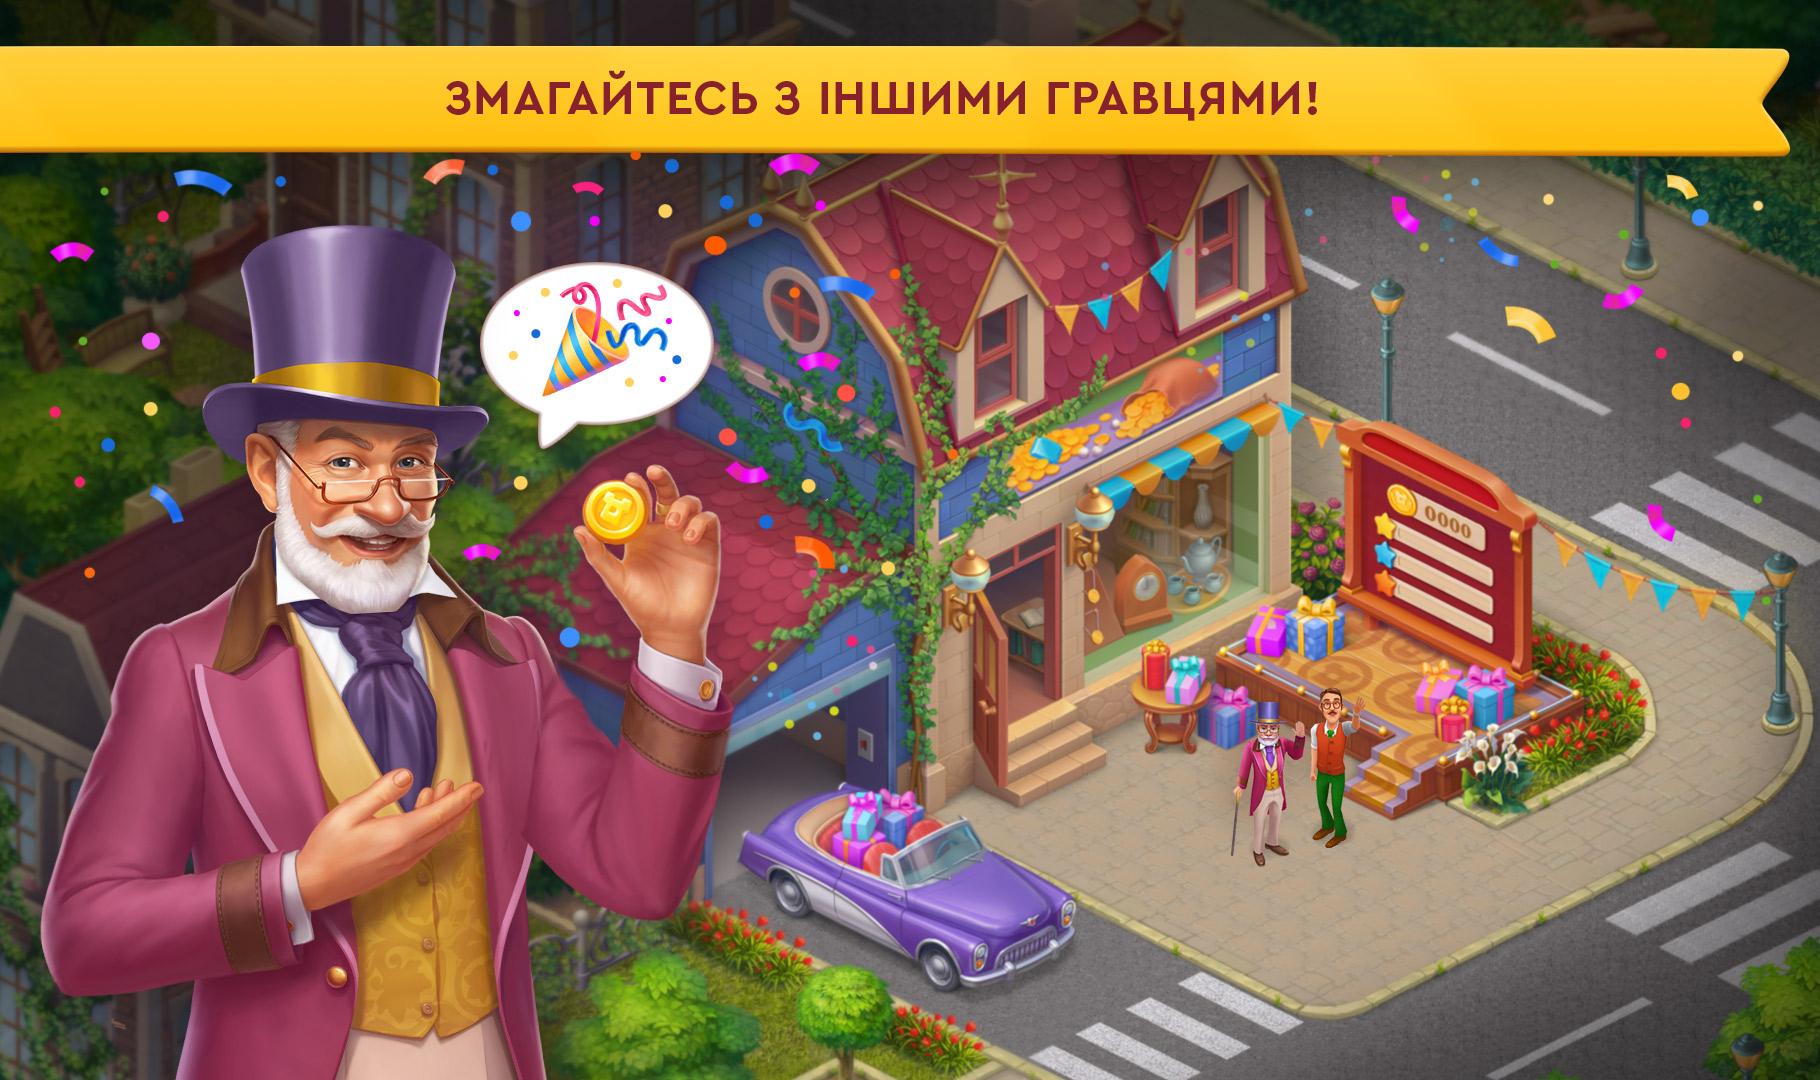 Post_5_ukr